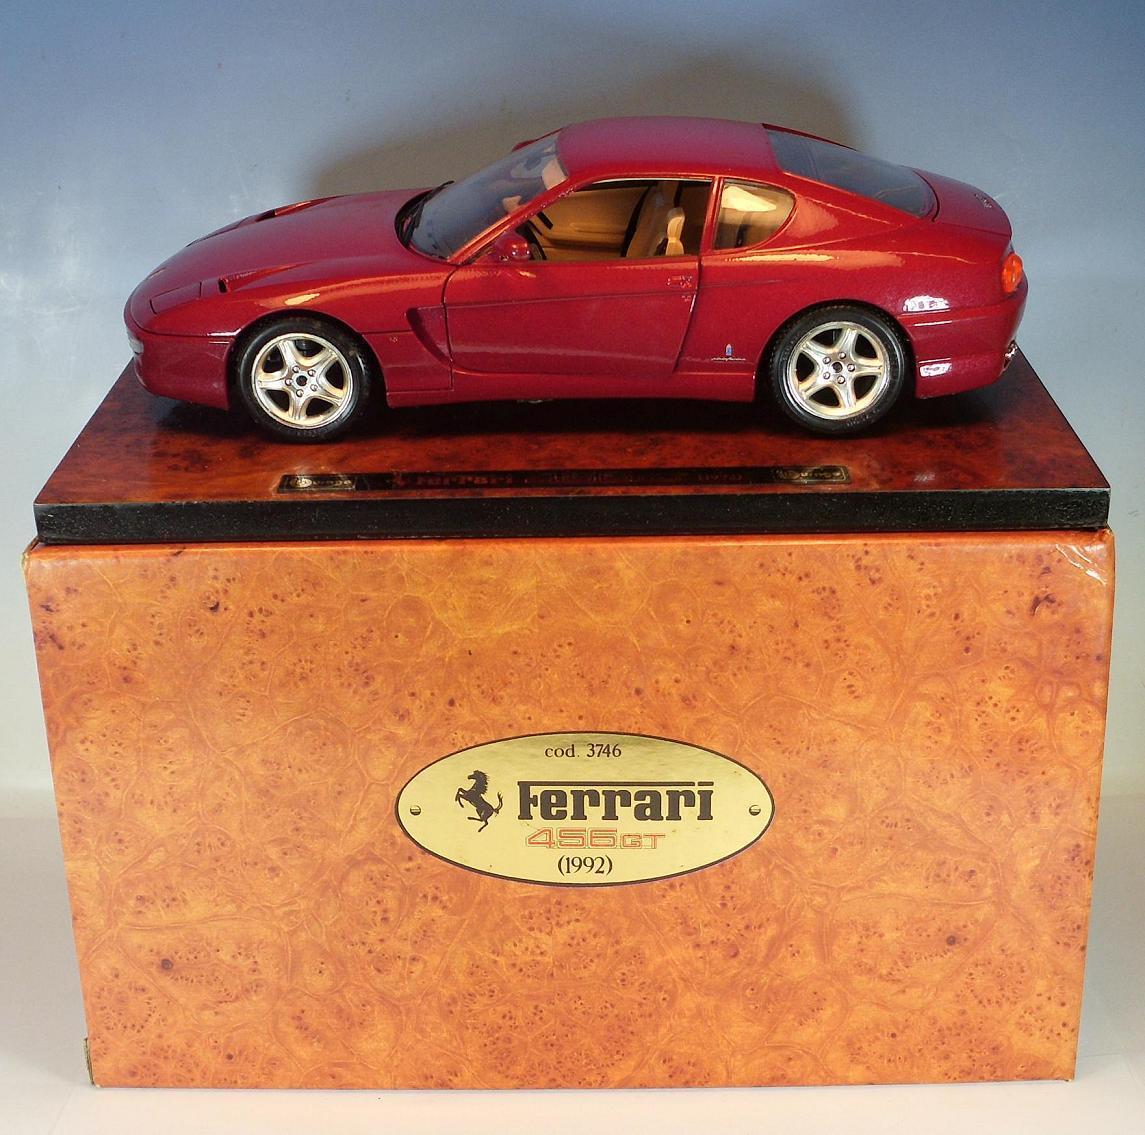 Bburago 1  18 Ferrari 456 GT (1992) röta auf Holzbas i OVP